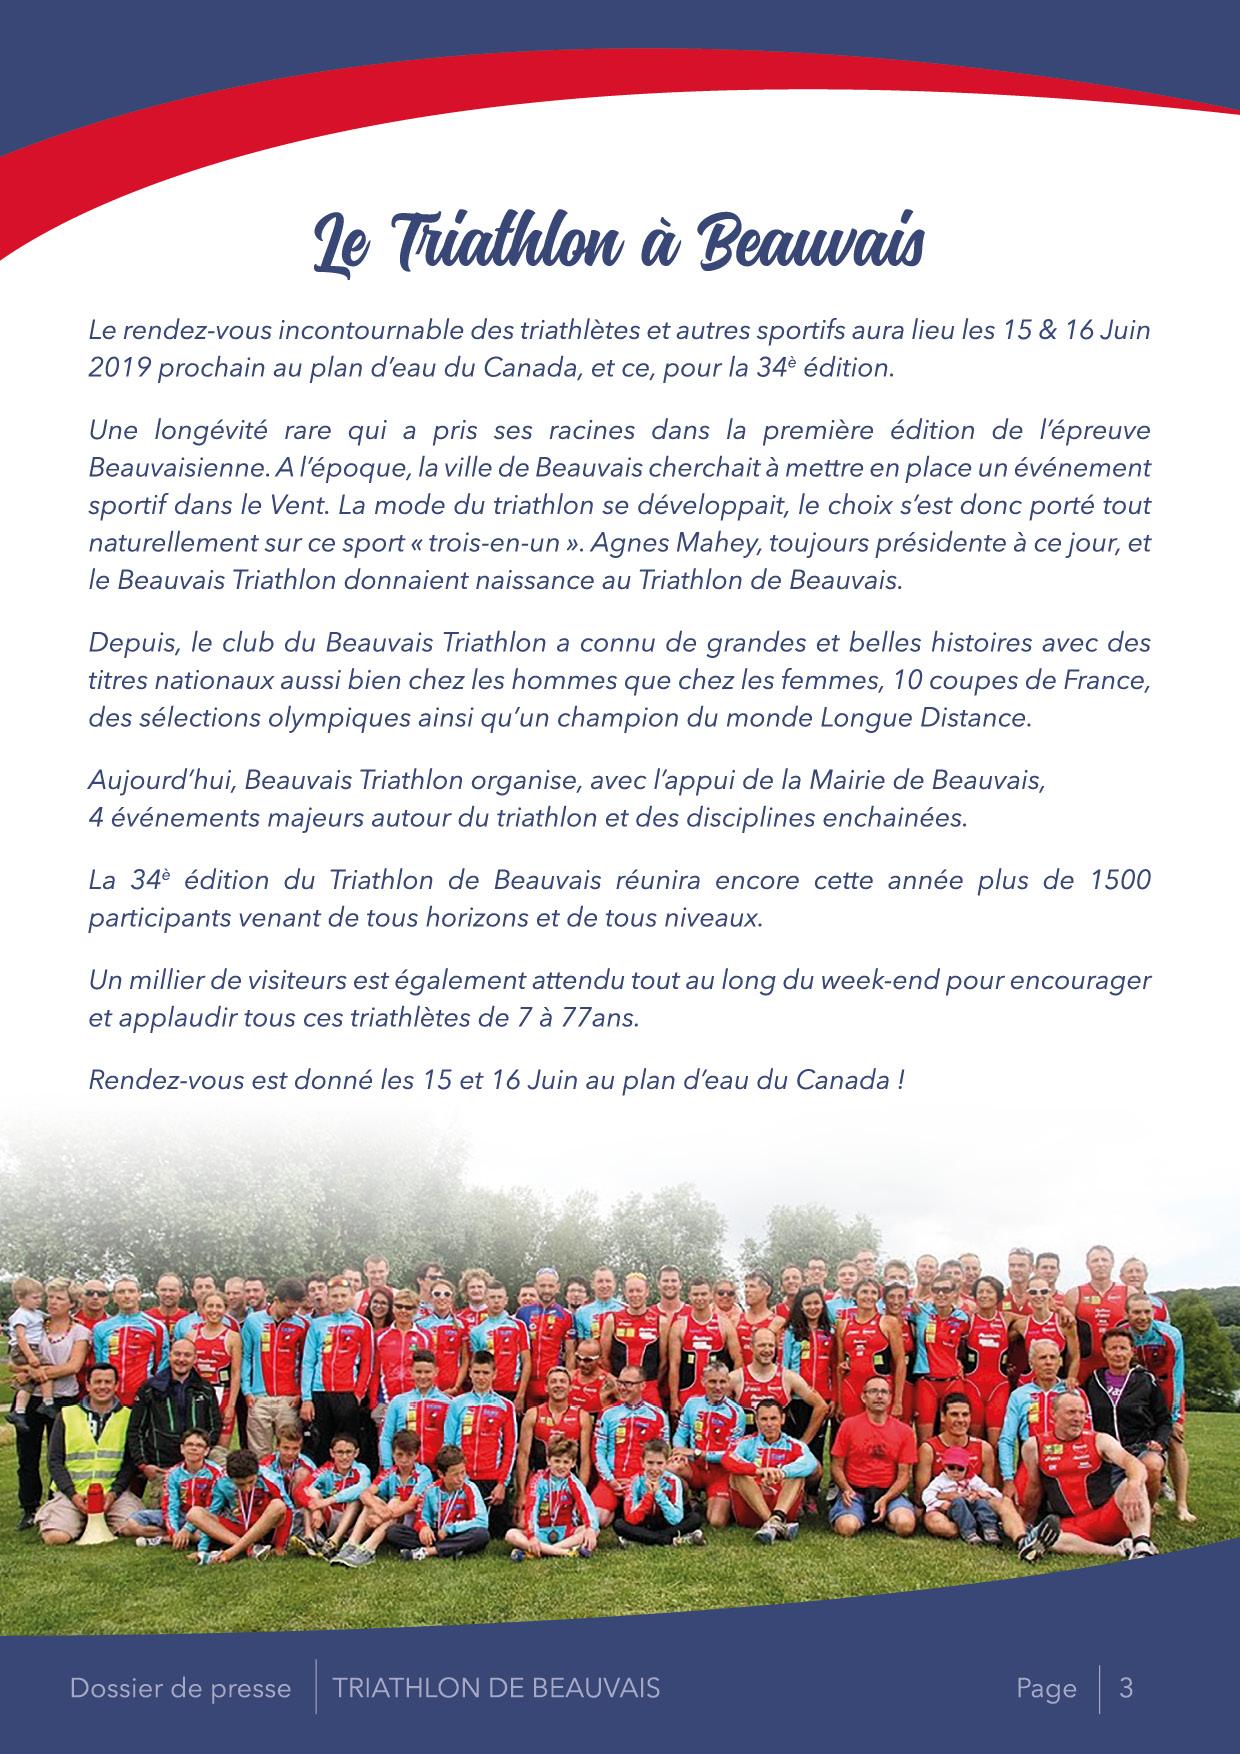 dossier-presse-triathlon-beauvais-vec3